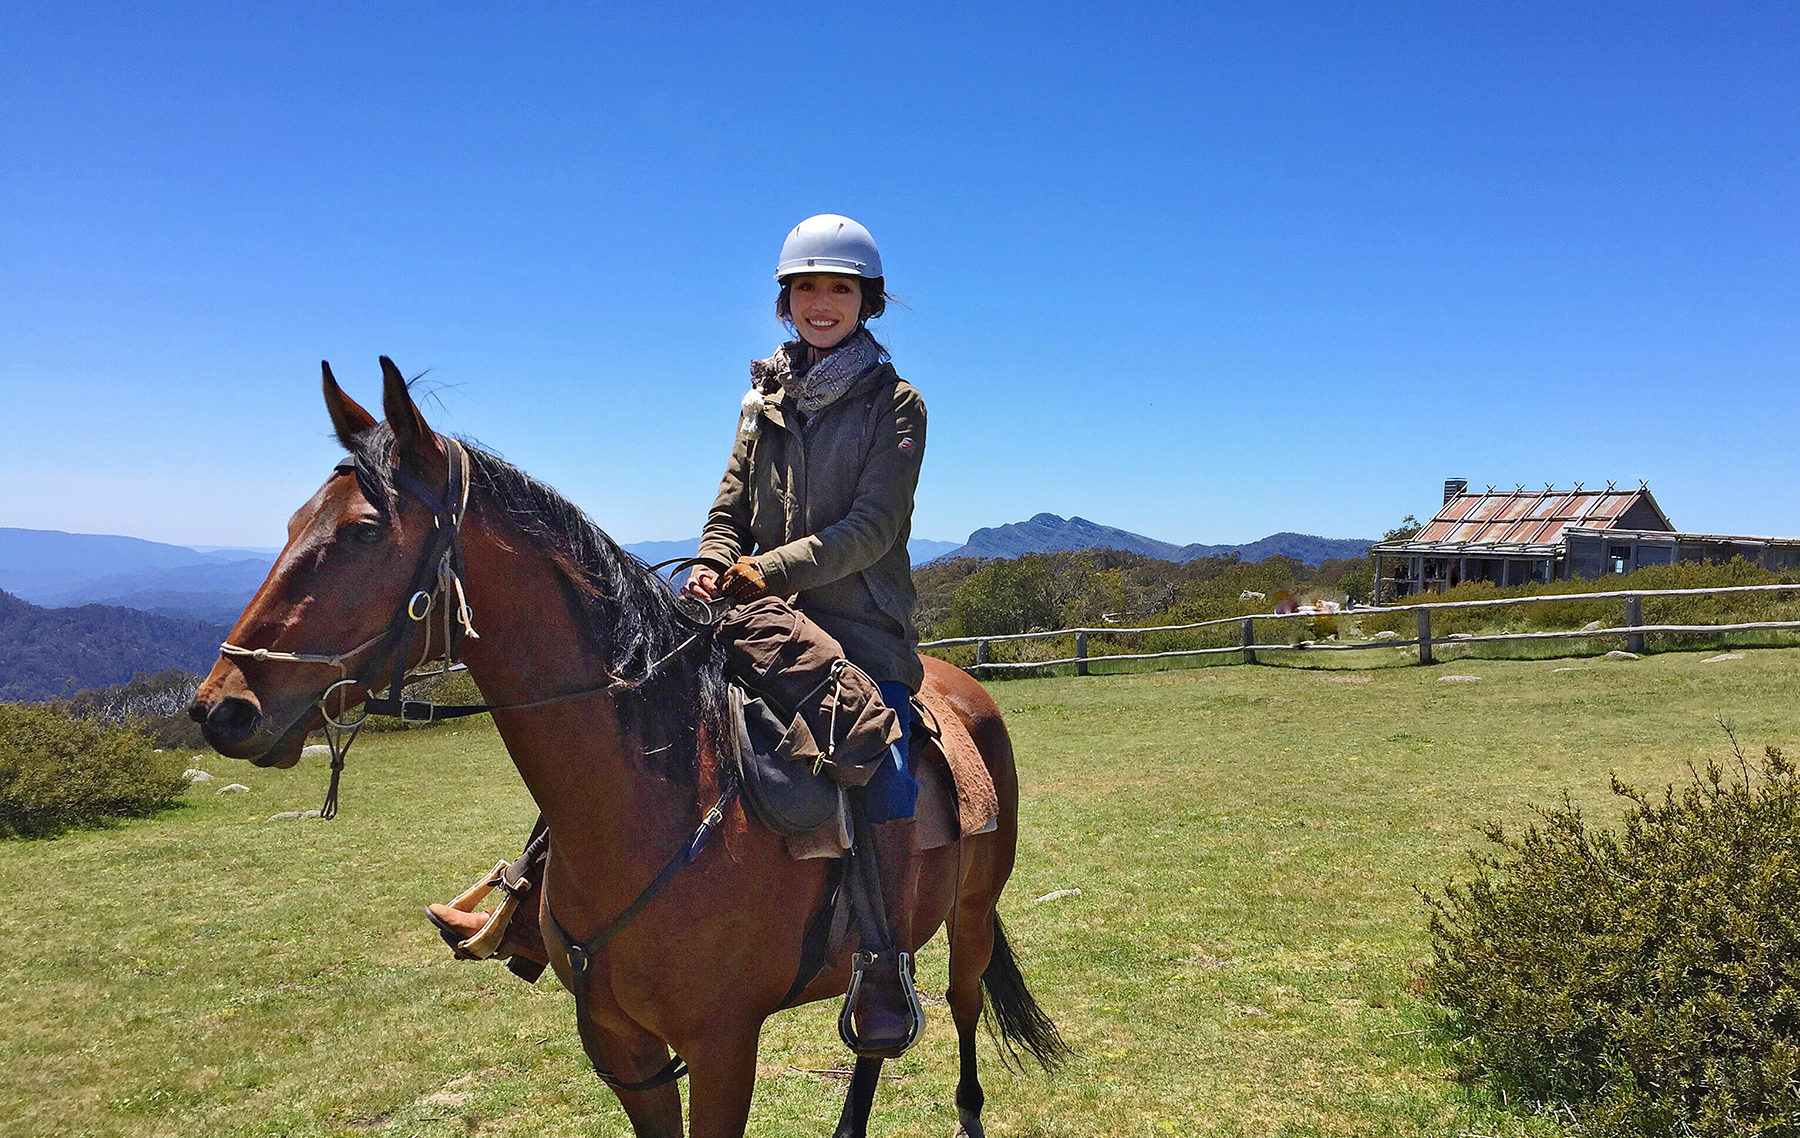 Craigs Hut High Country Ride, Victoria, Australia - Globetrotting horse riding holidays